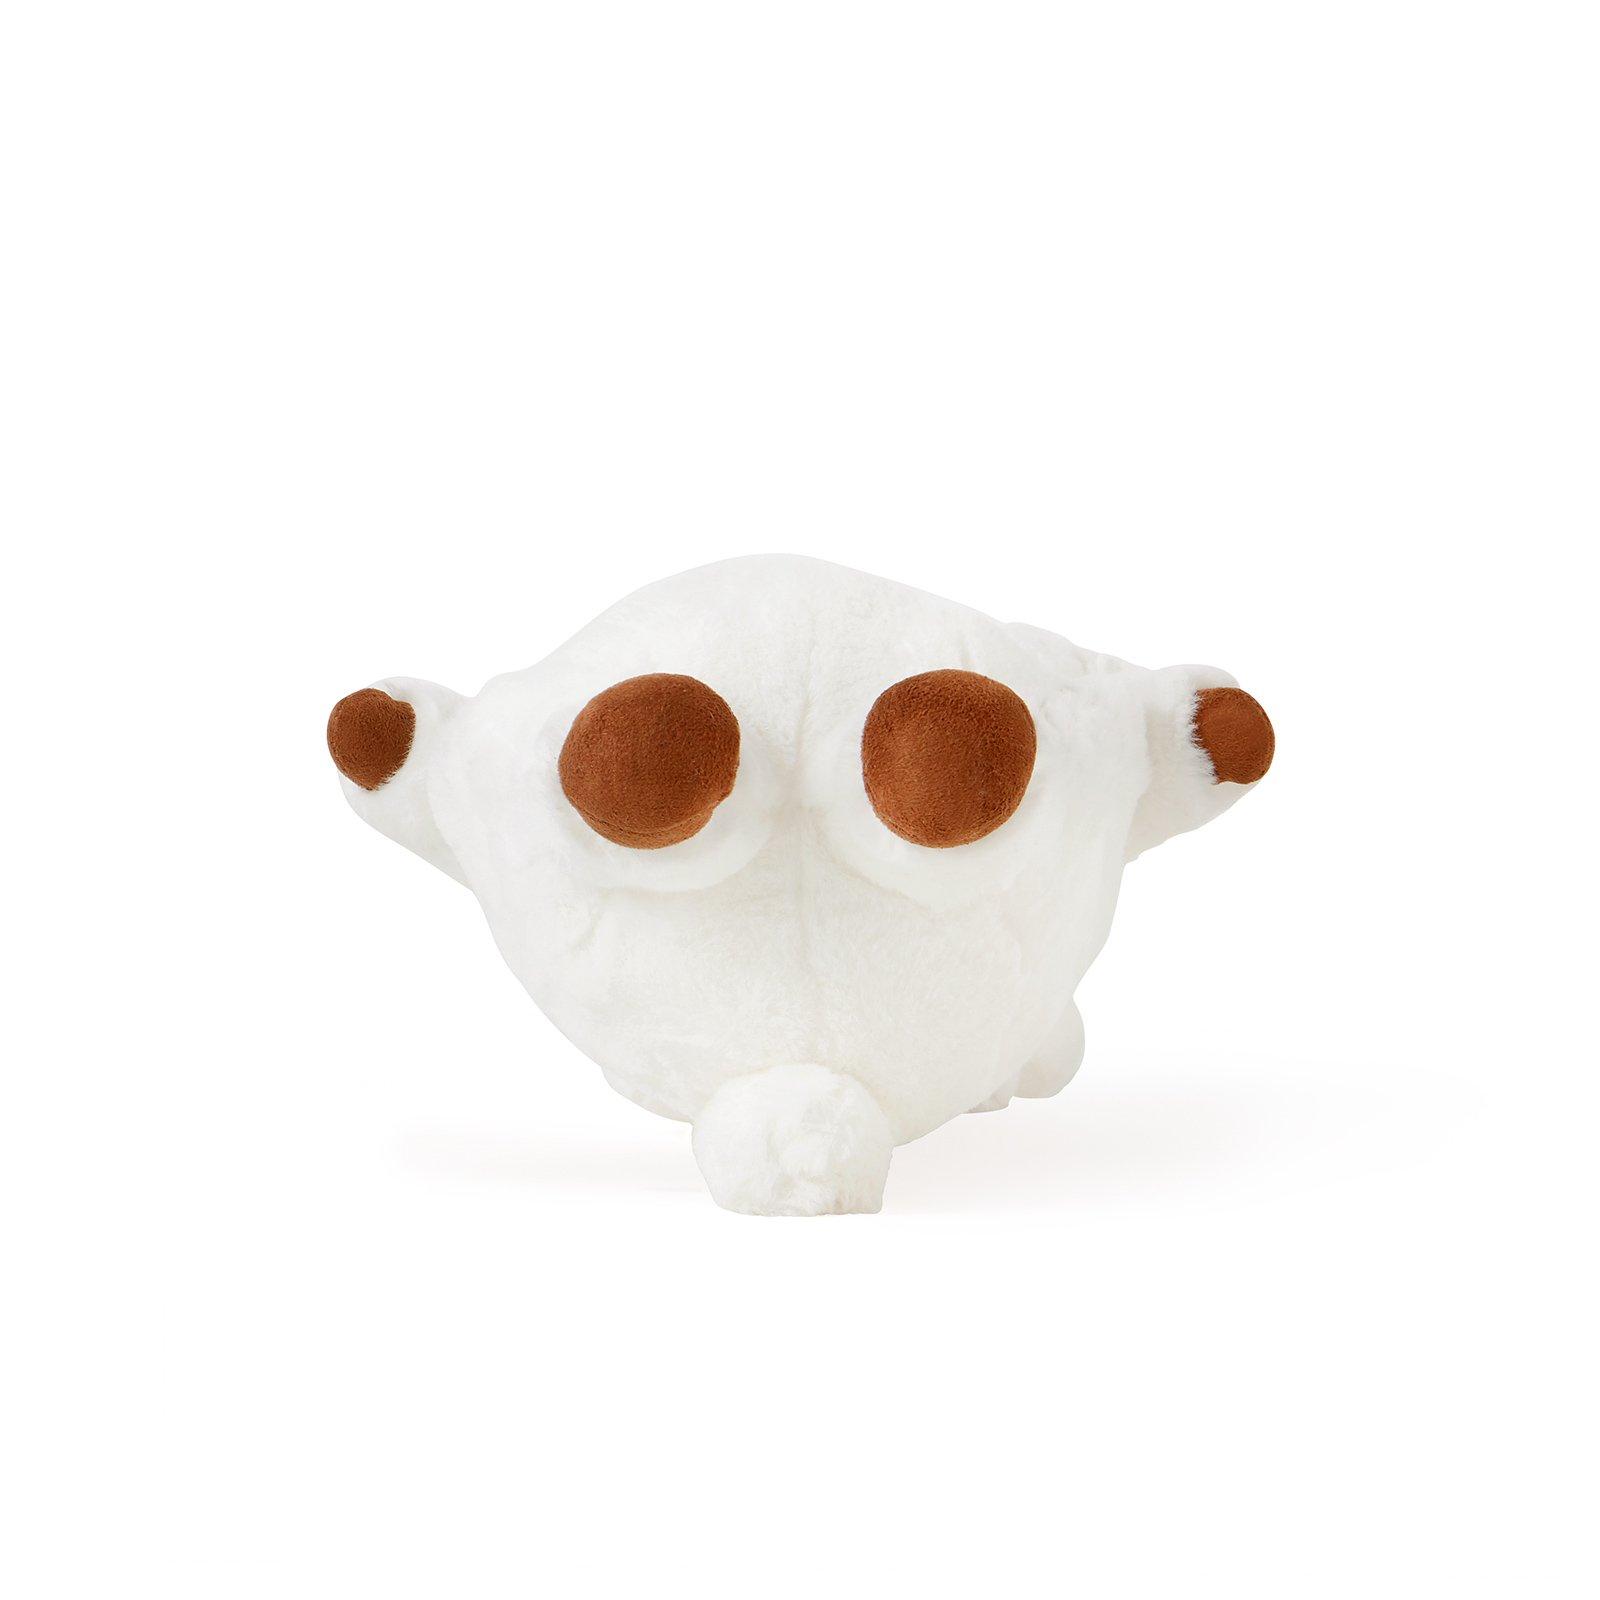 BT21 RJ Standing Plush Doll Medium White by BT21 (Image #6)